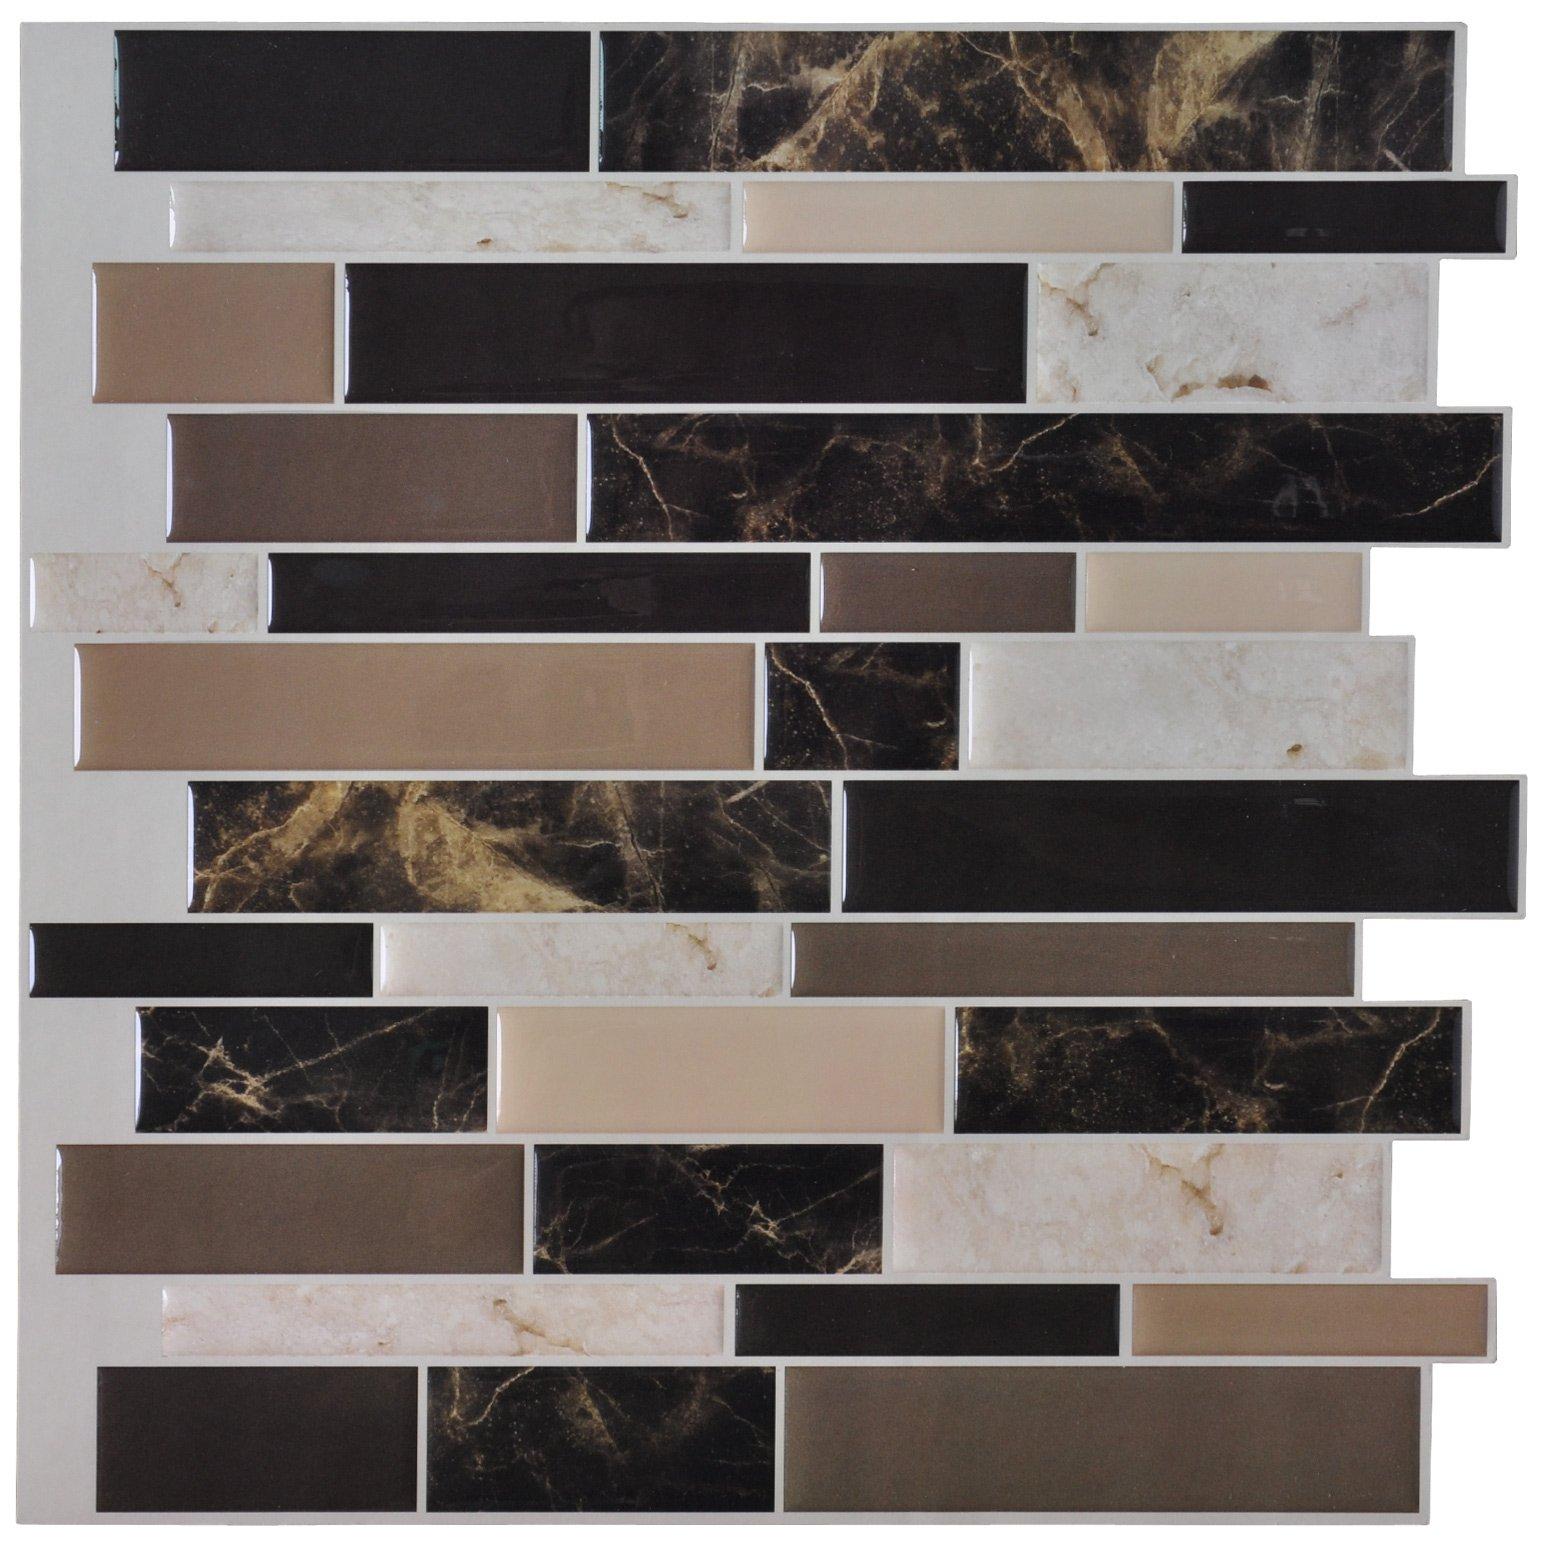 Art3d 6-Pack Peel and Stick Vinyl Sticker Kitchen Backsplash Tiles, 12'' x 12'' Marble Design